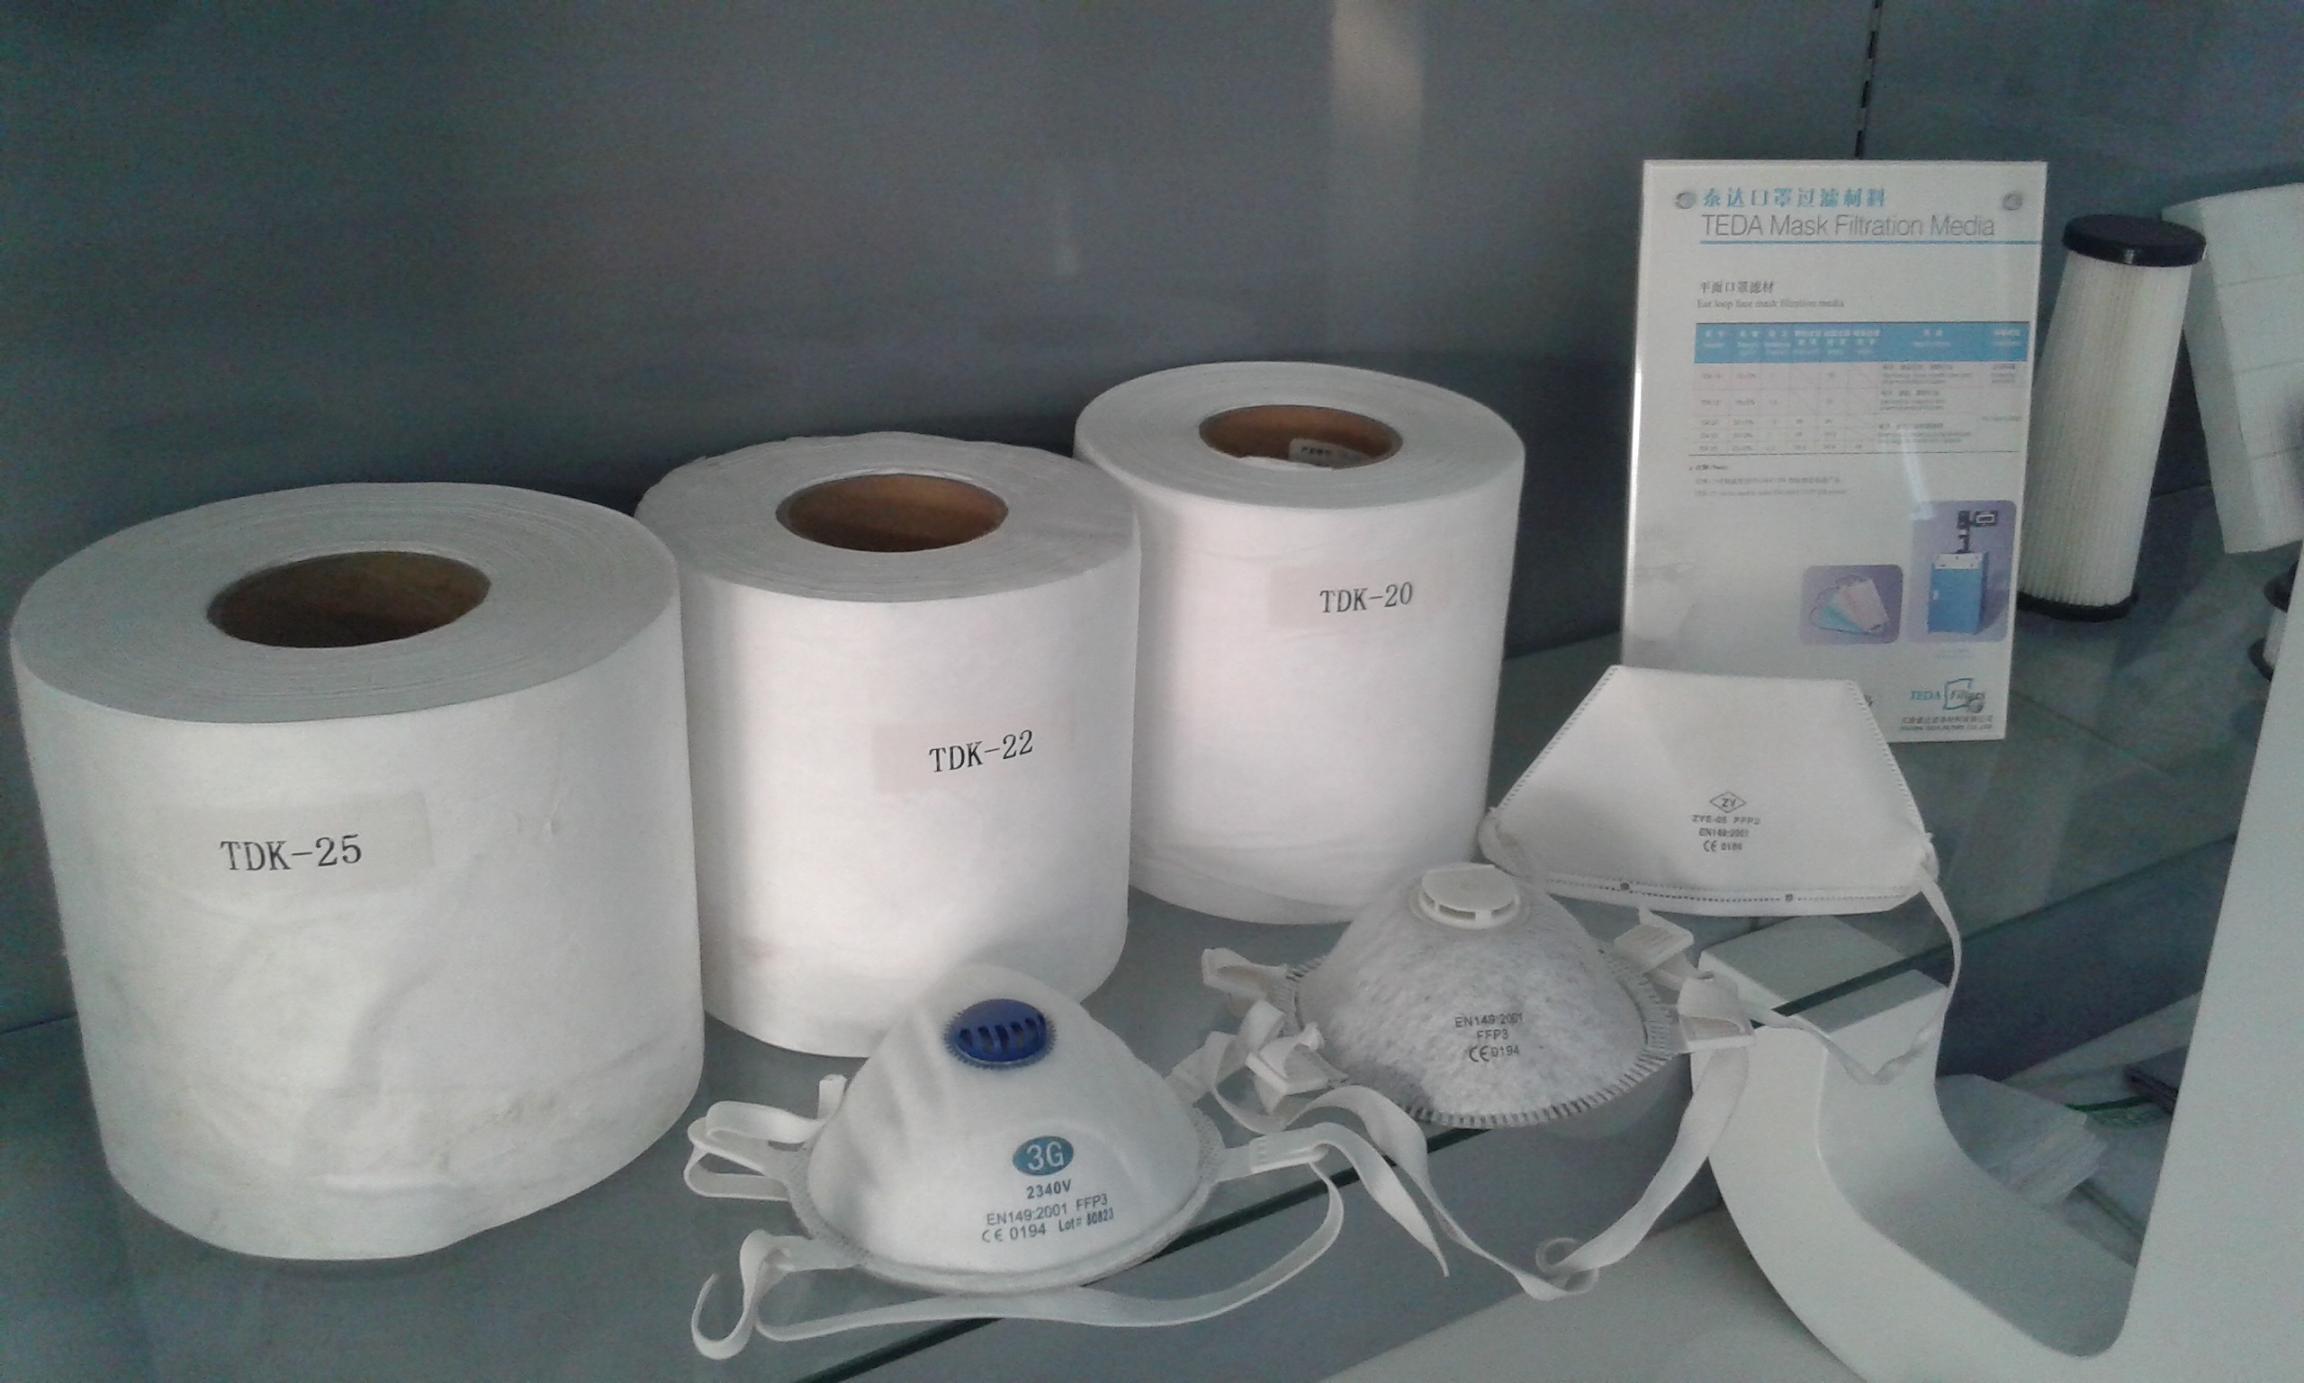 Nonwoven Filter Media for Respirator